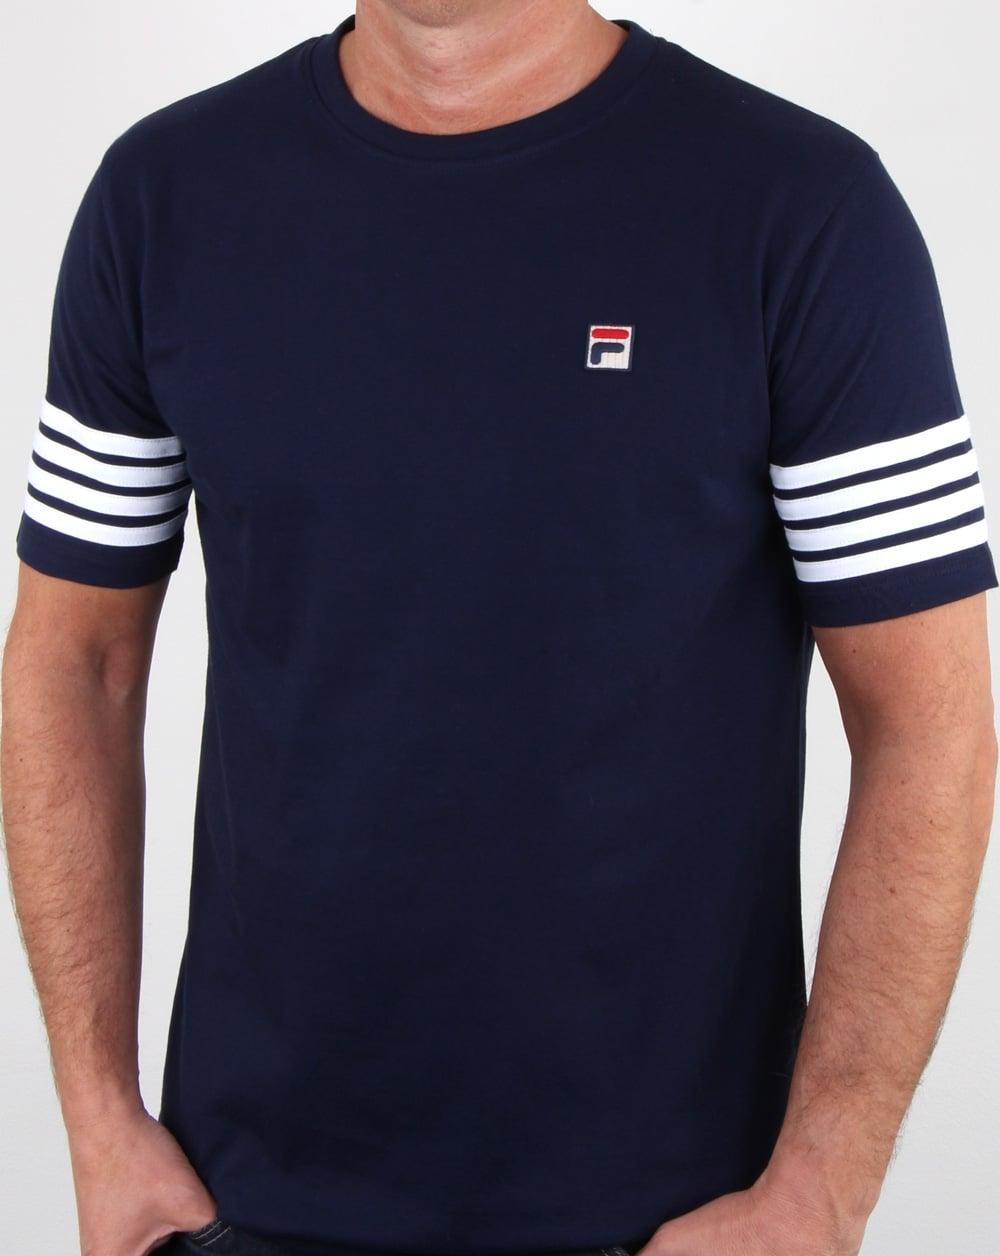 Fila Vintage 4 Stripe T-shirt Navy\/white| 80s casual classics